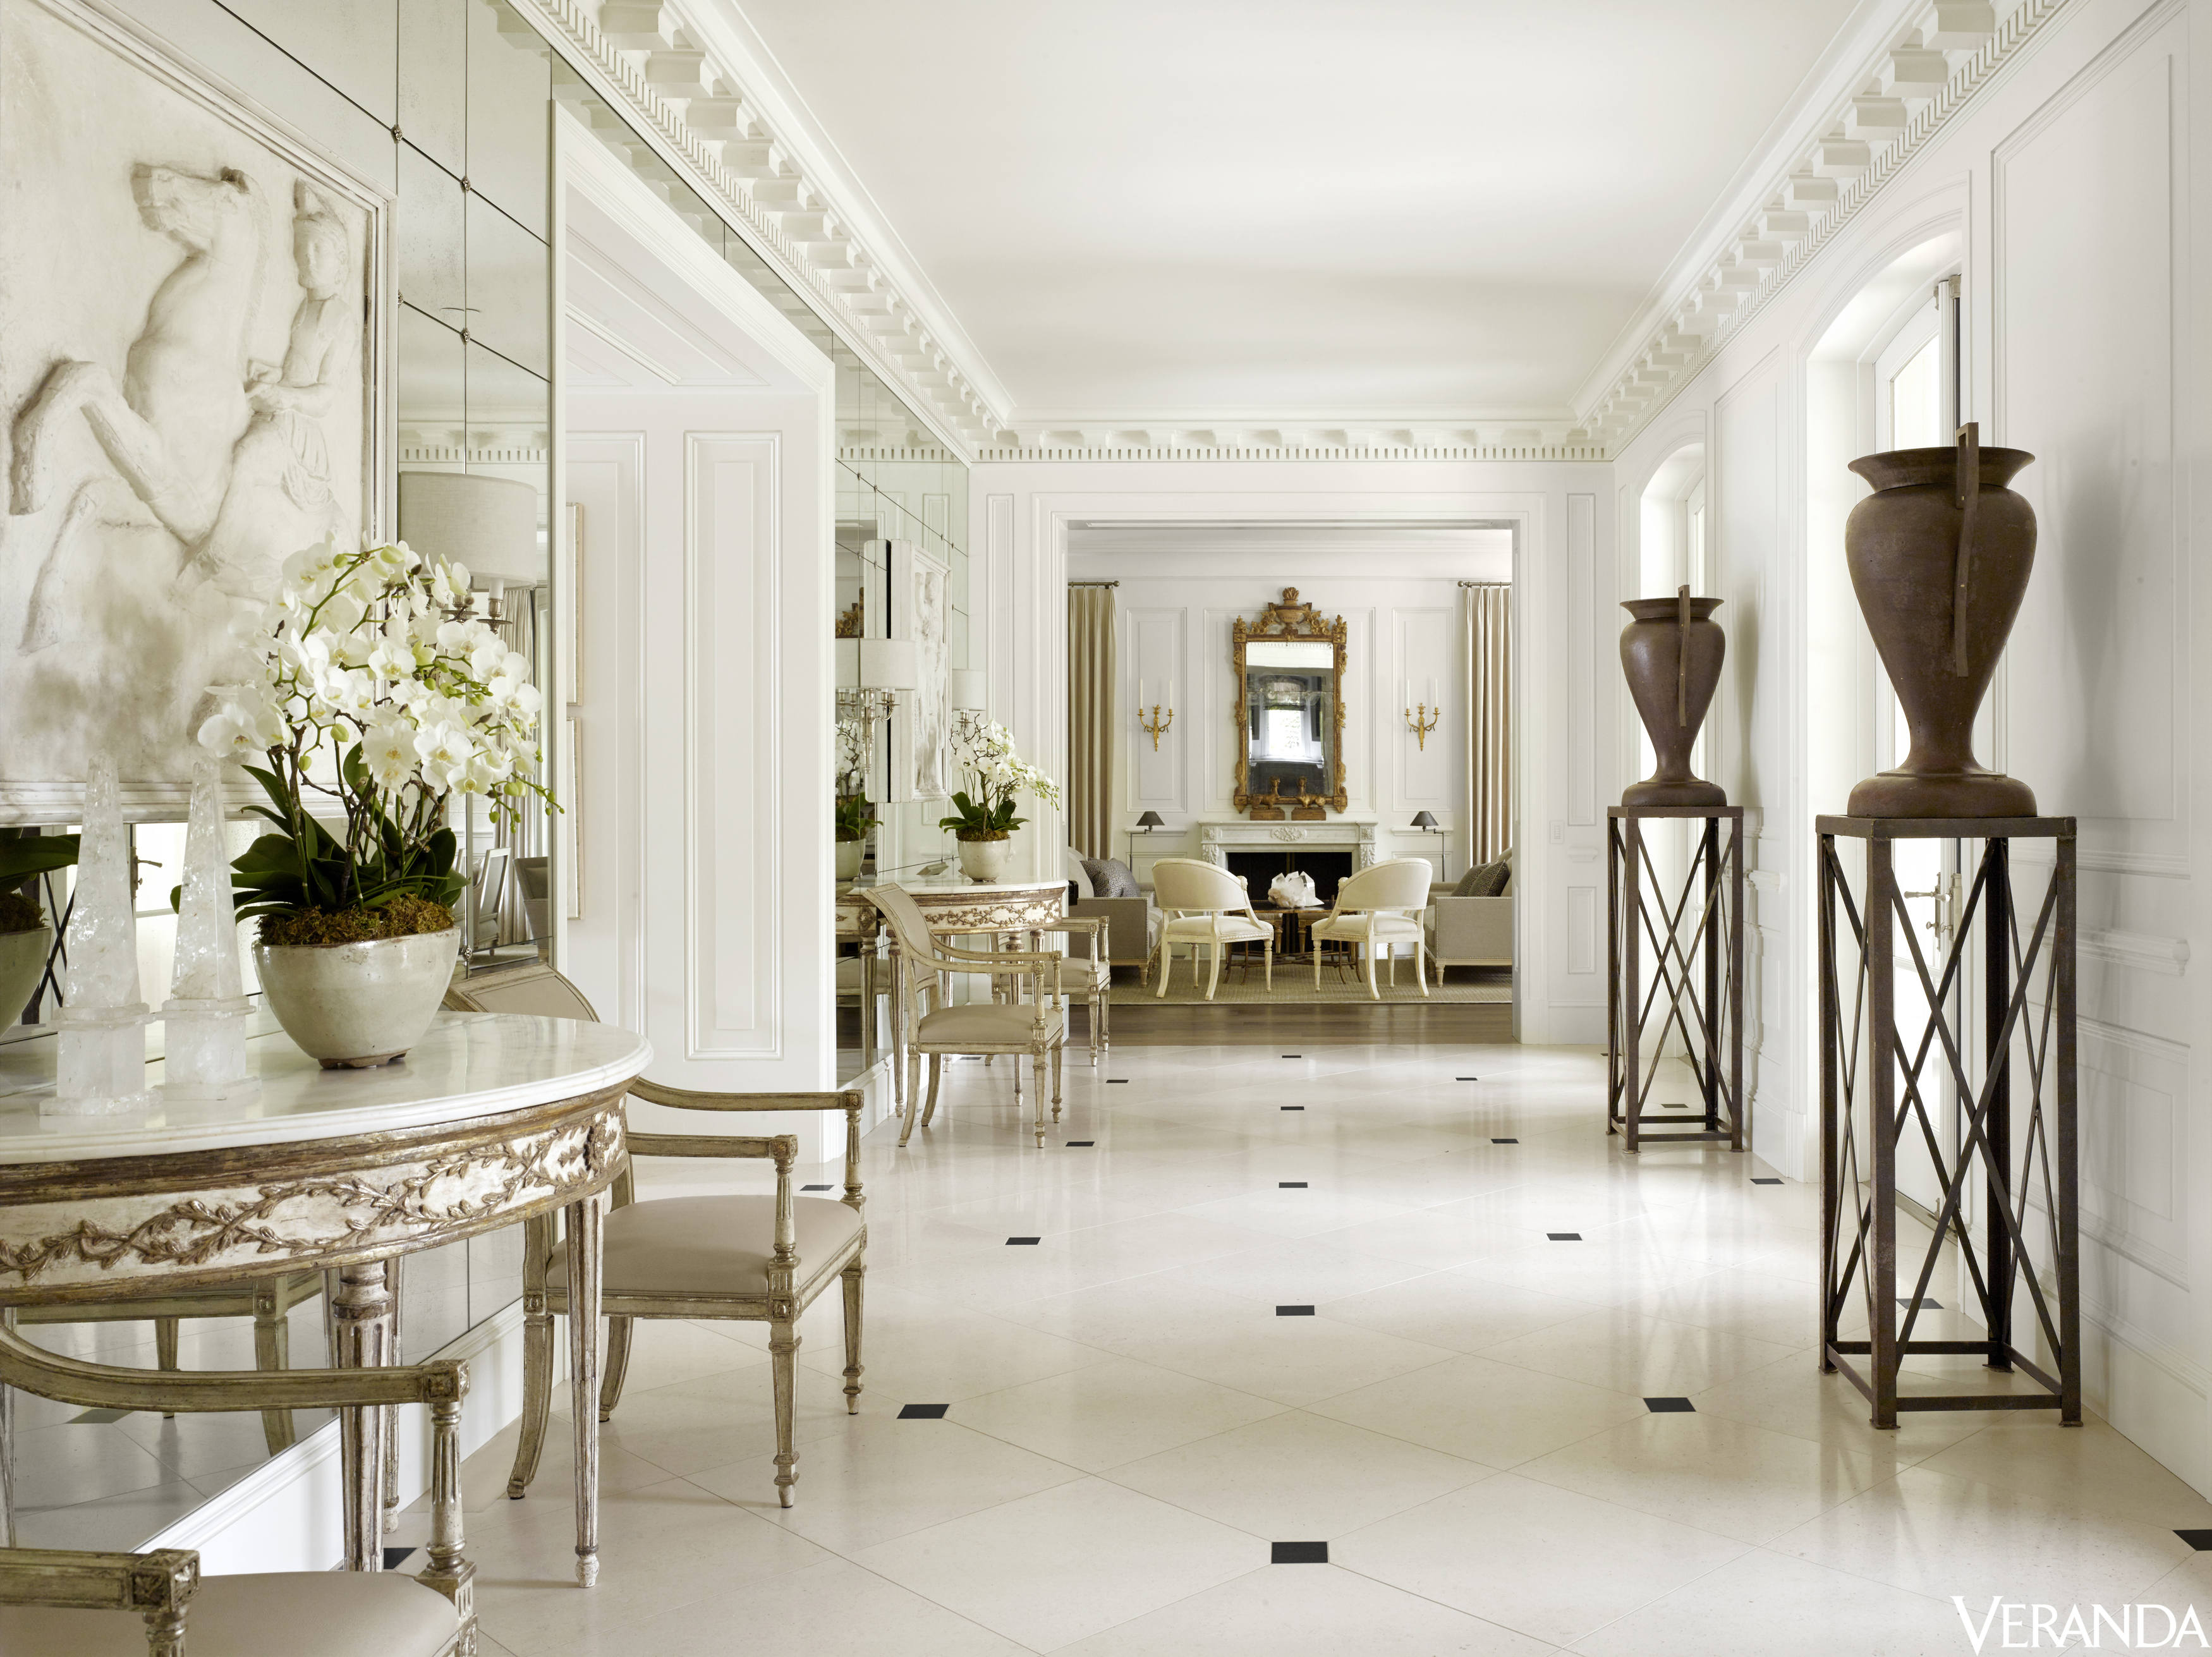 House tour a california mansion with sumptuous french for Apartamentos minimalistas